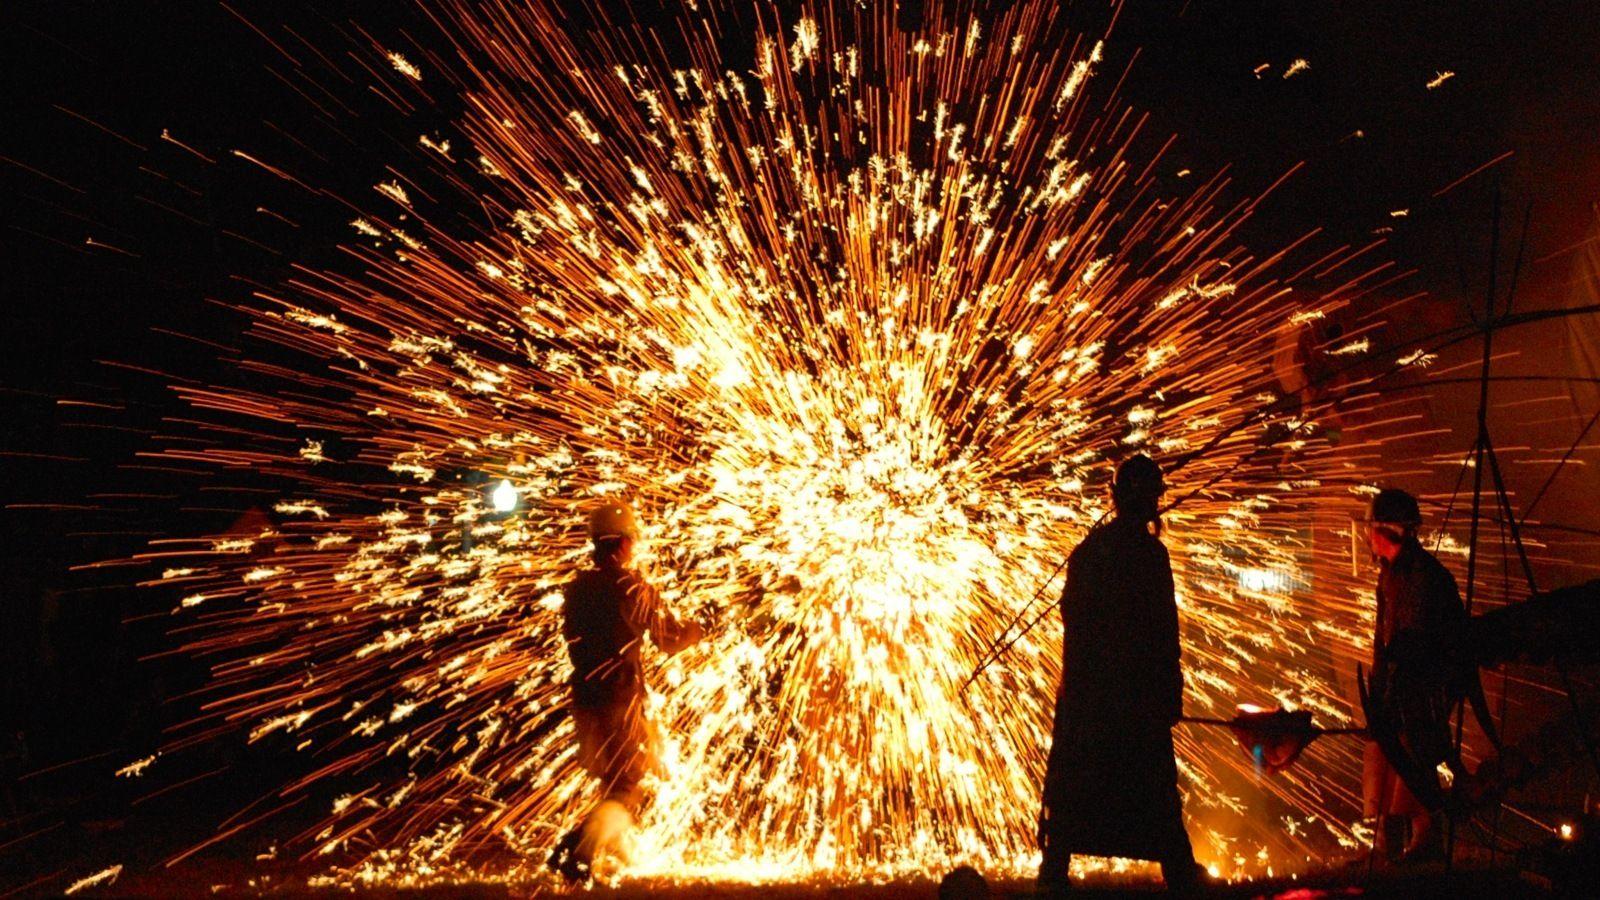 Da Shuhua 2019 in Nuanquan, China Celebration around the